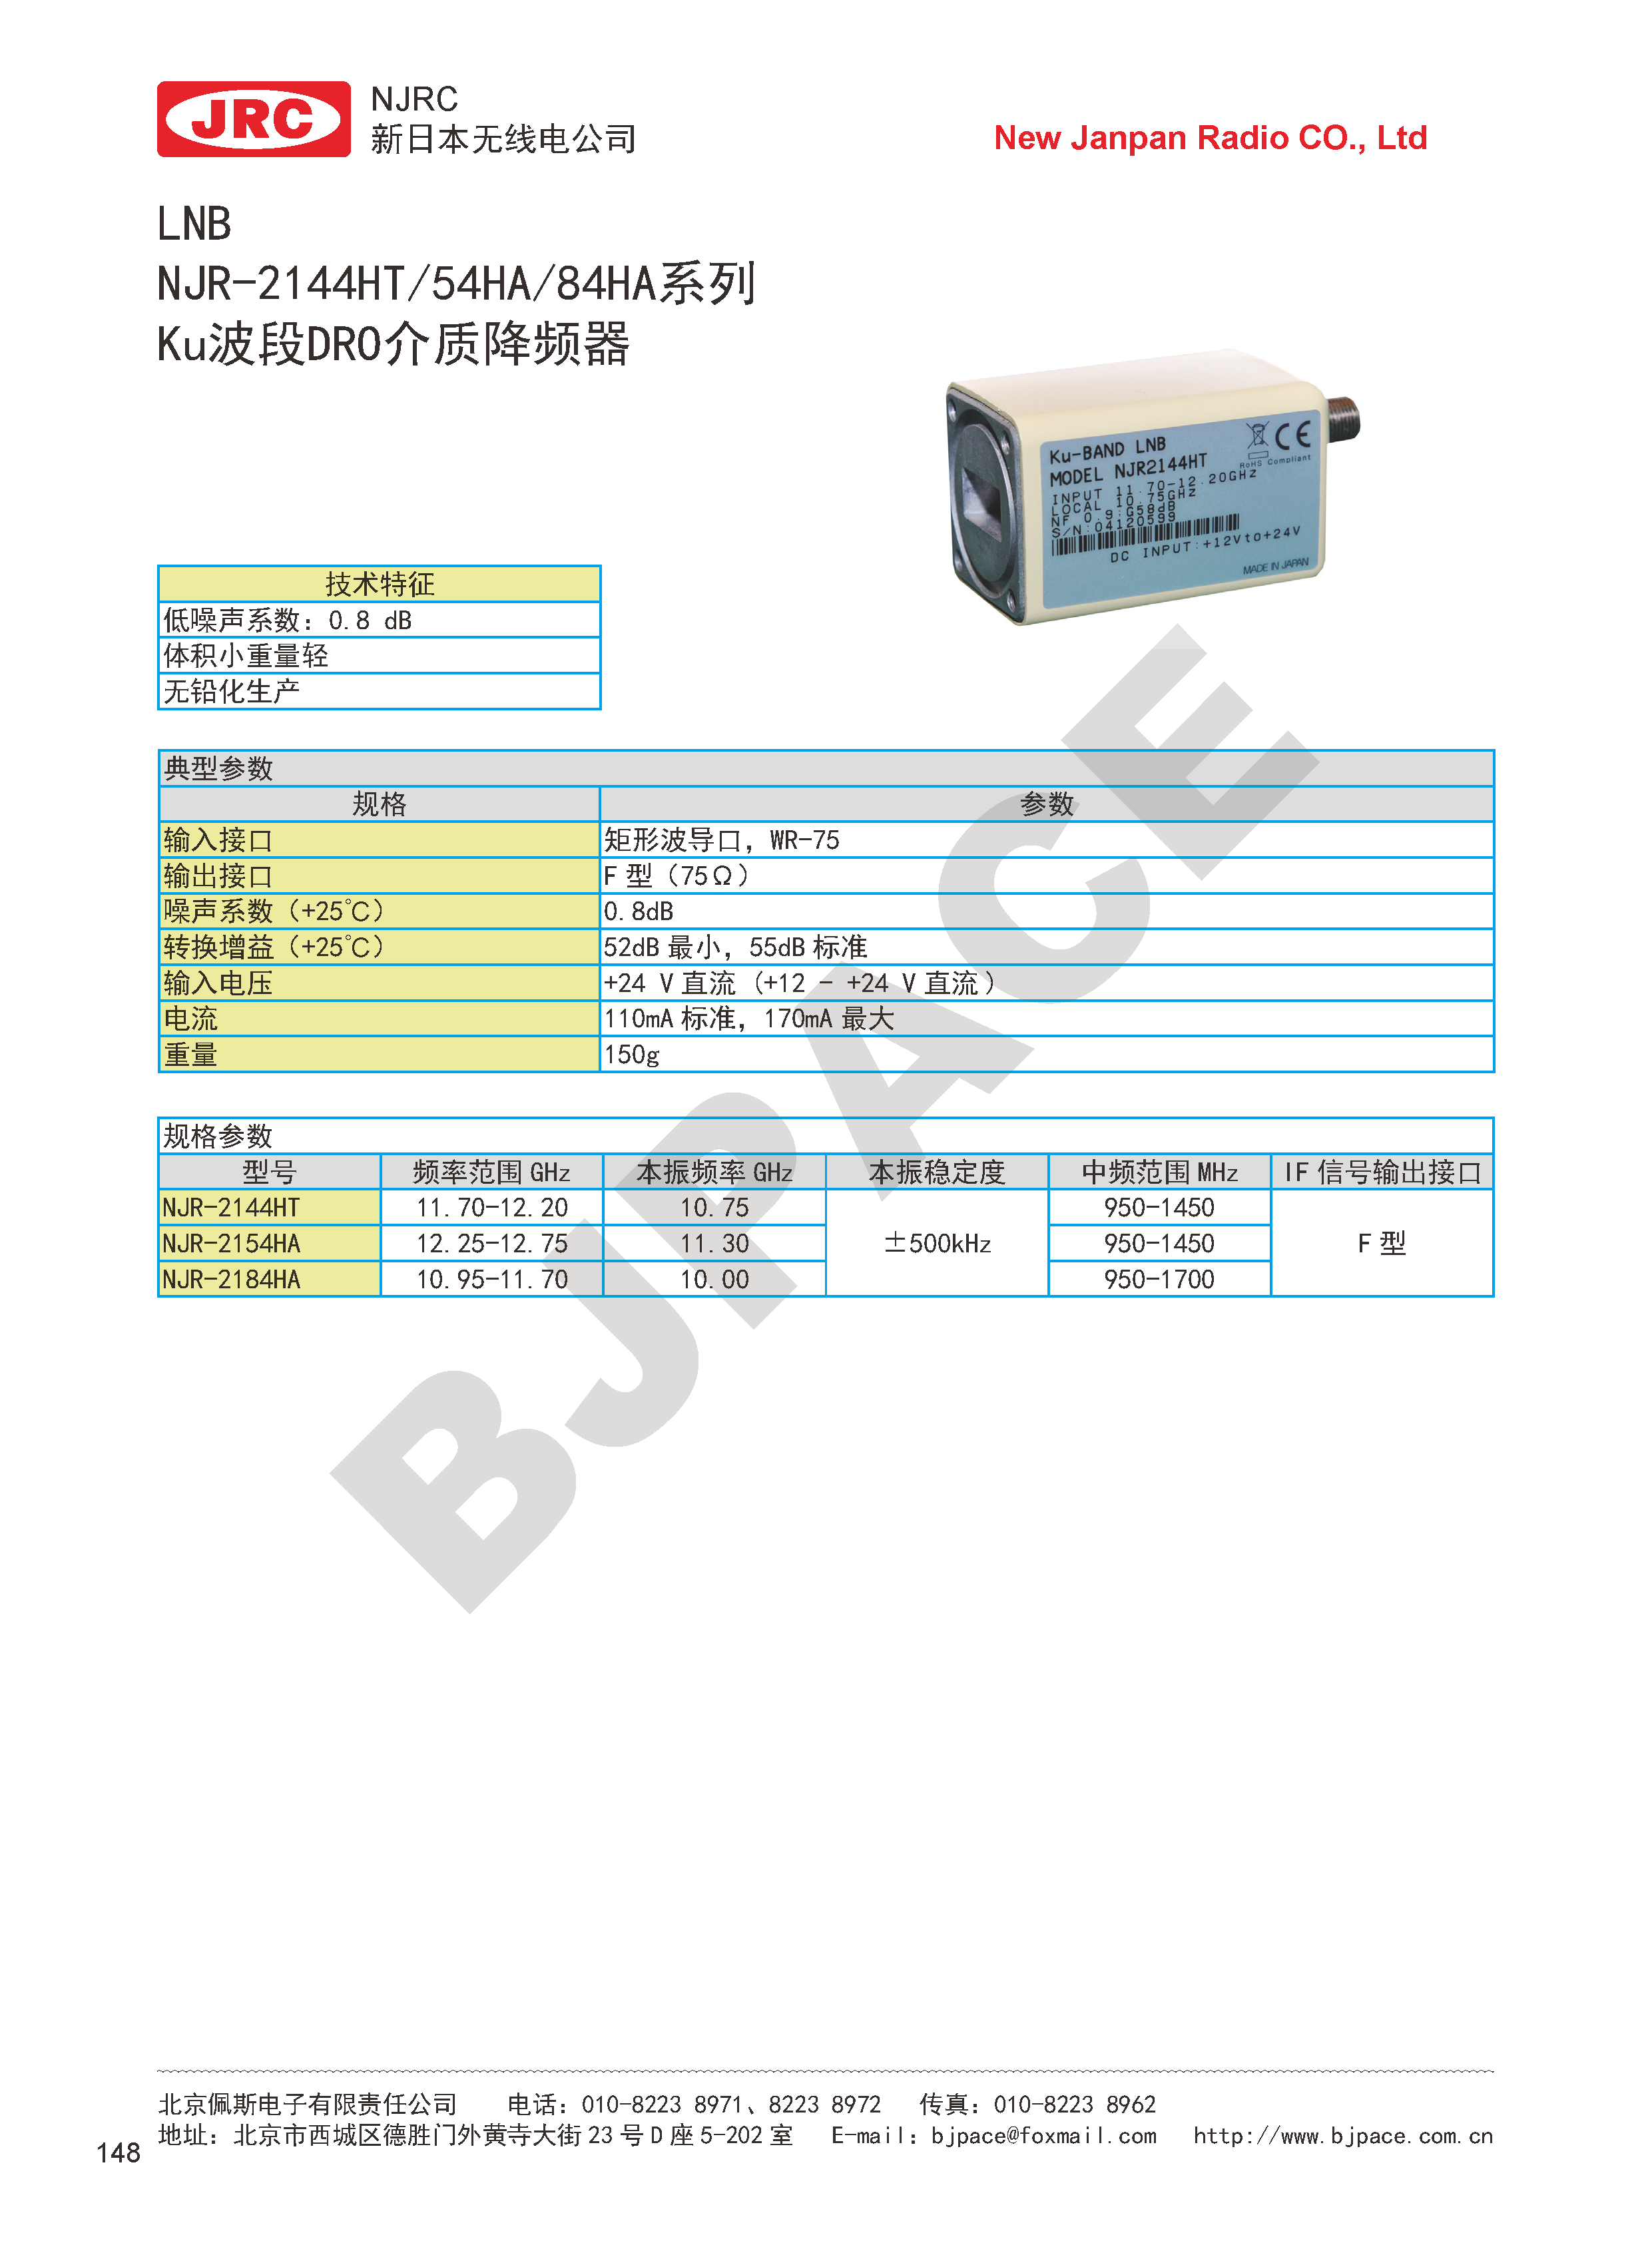 NJR-2144HT-54HA-84HA系列Ku波段DRO介質降頻器